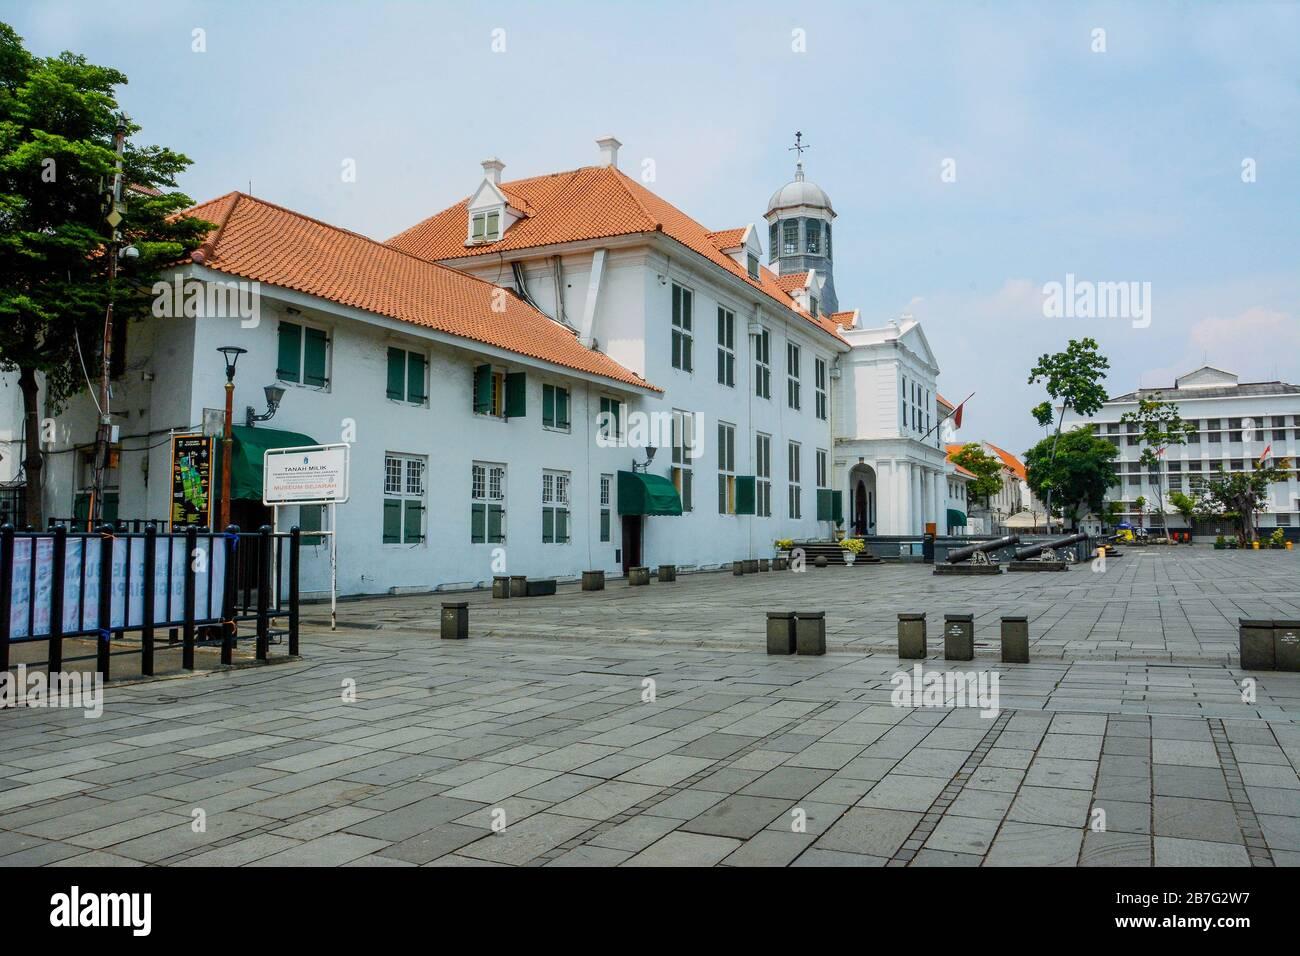 Jakarta Indonesia 16th Mar 2020 Taken Picture At Taman Fatahillah Kota Tua During A Temporary Closure